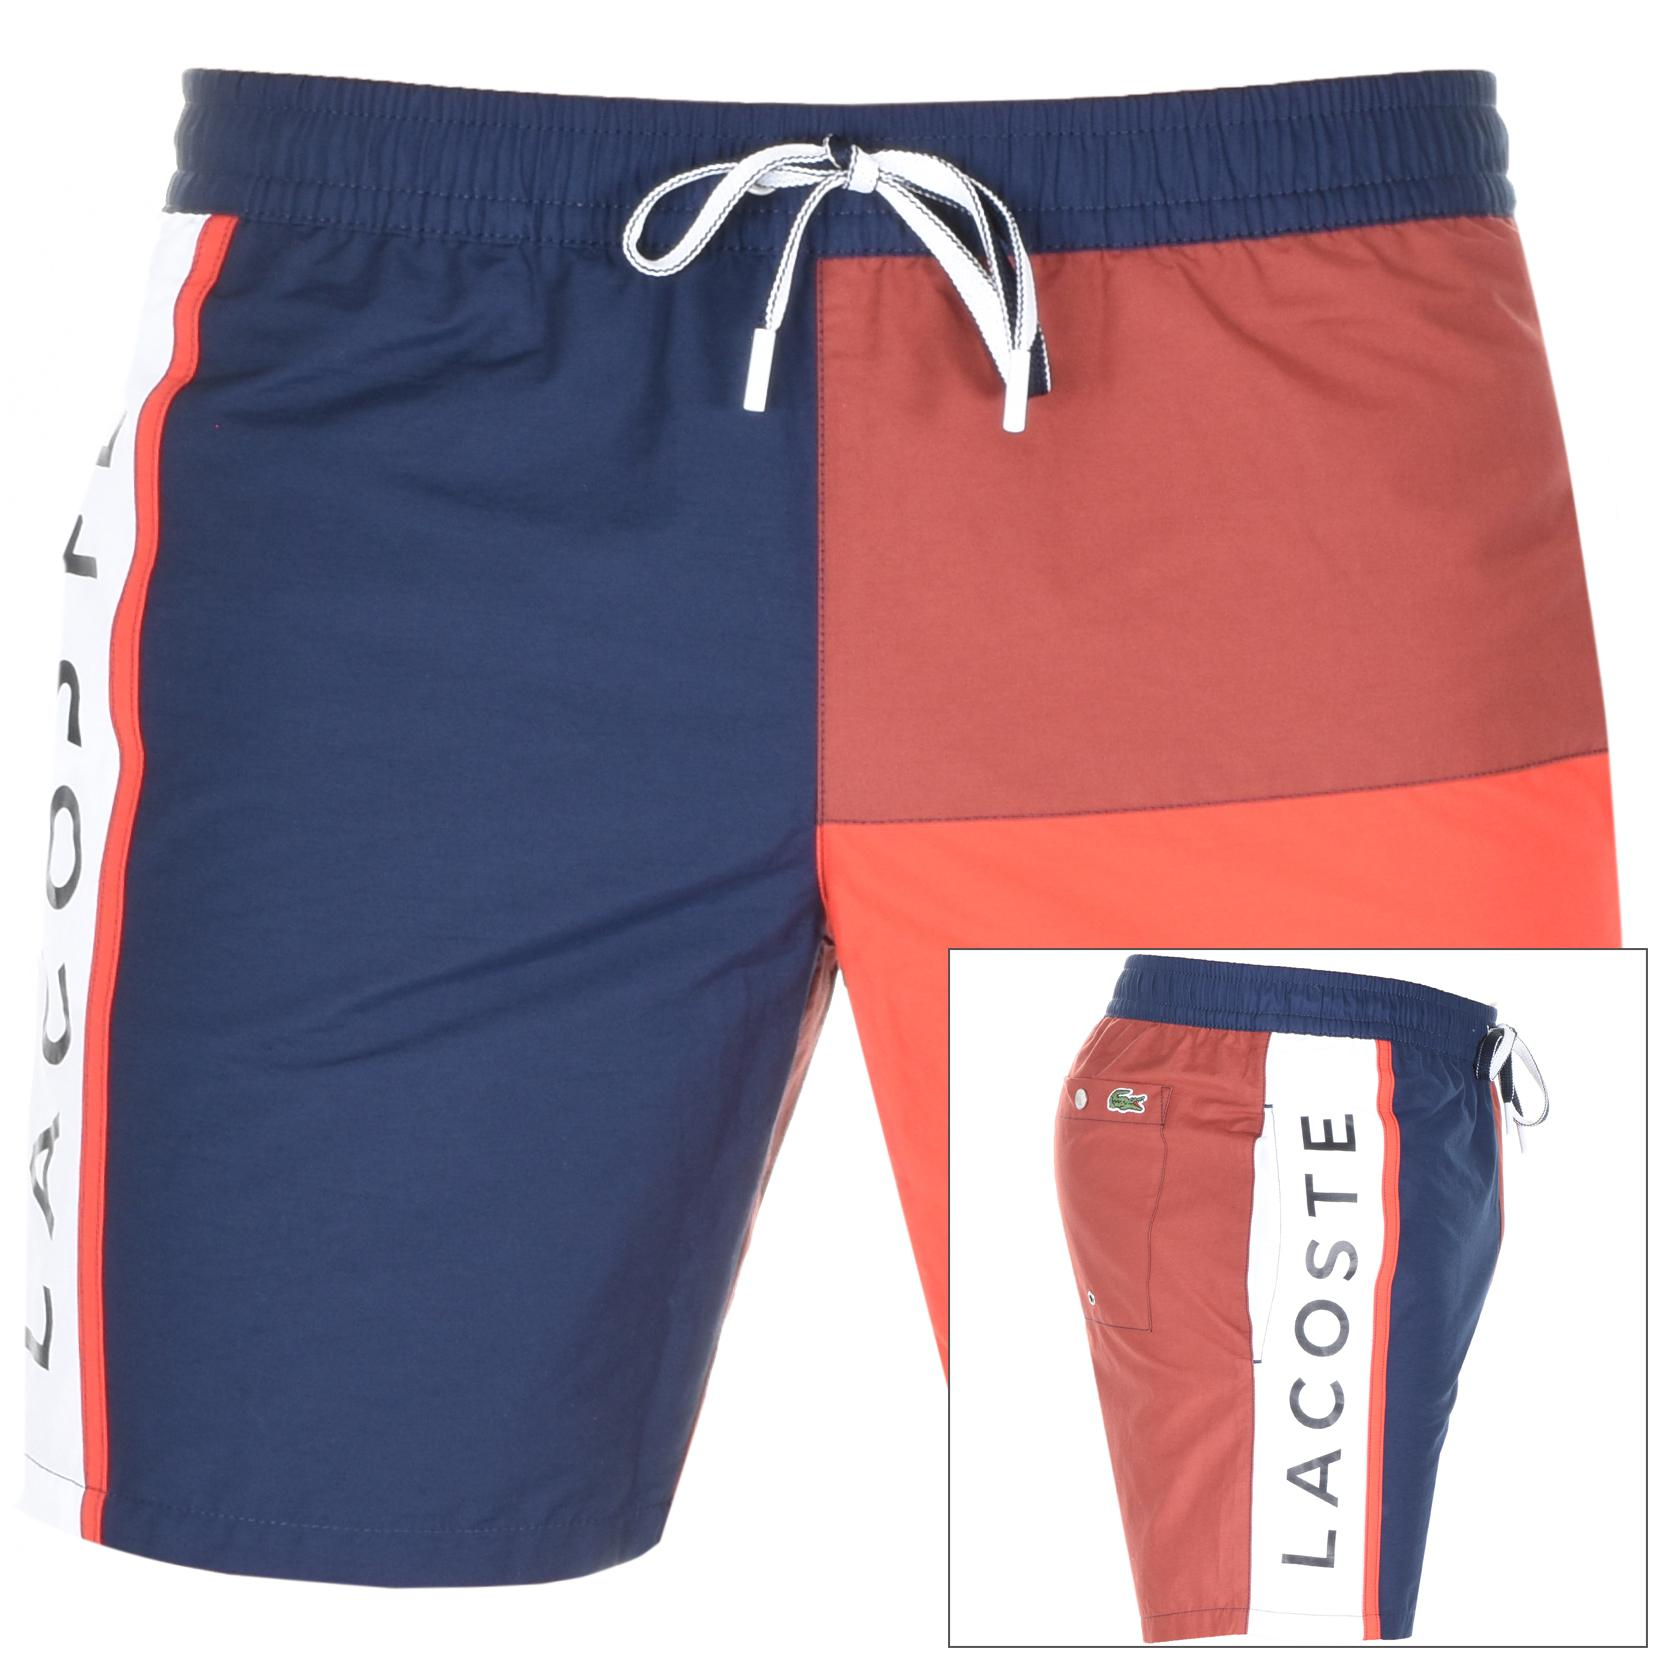 48d33a55a5c964 Lacoste - Blue Logo Swim Shorts Navy for Men - Lyst. View fullscreen